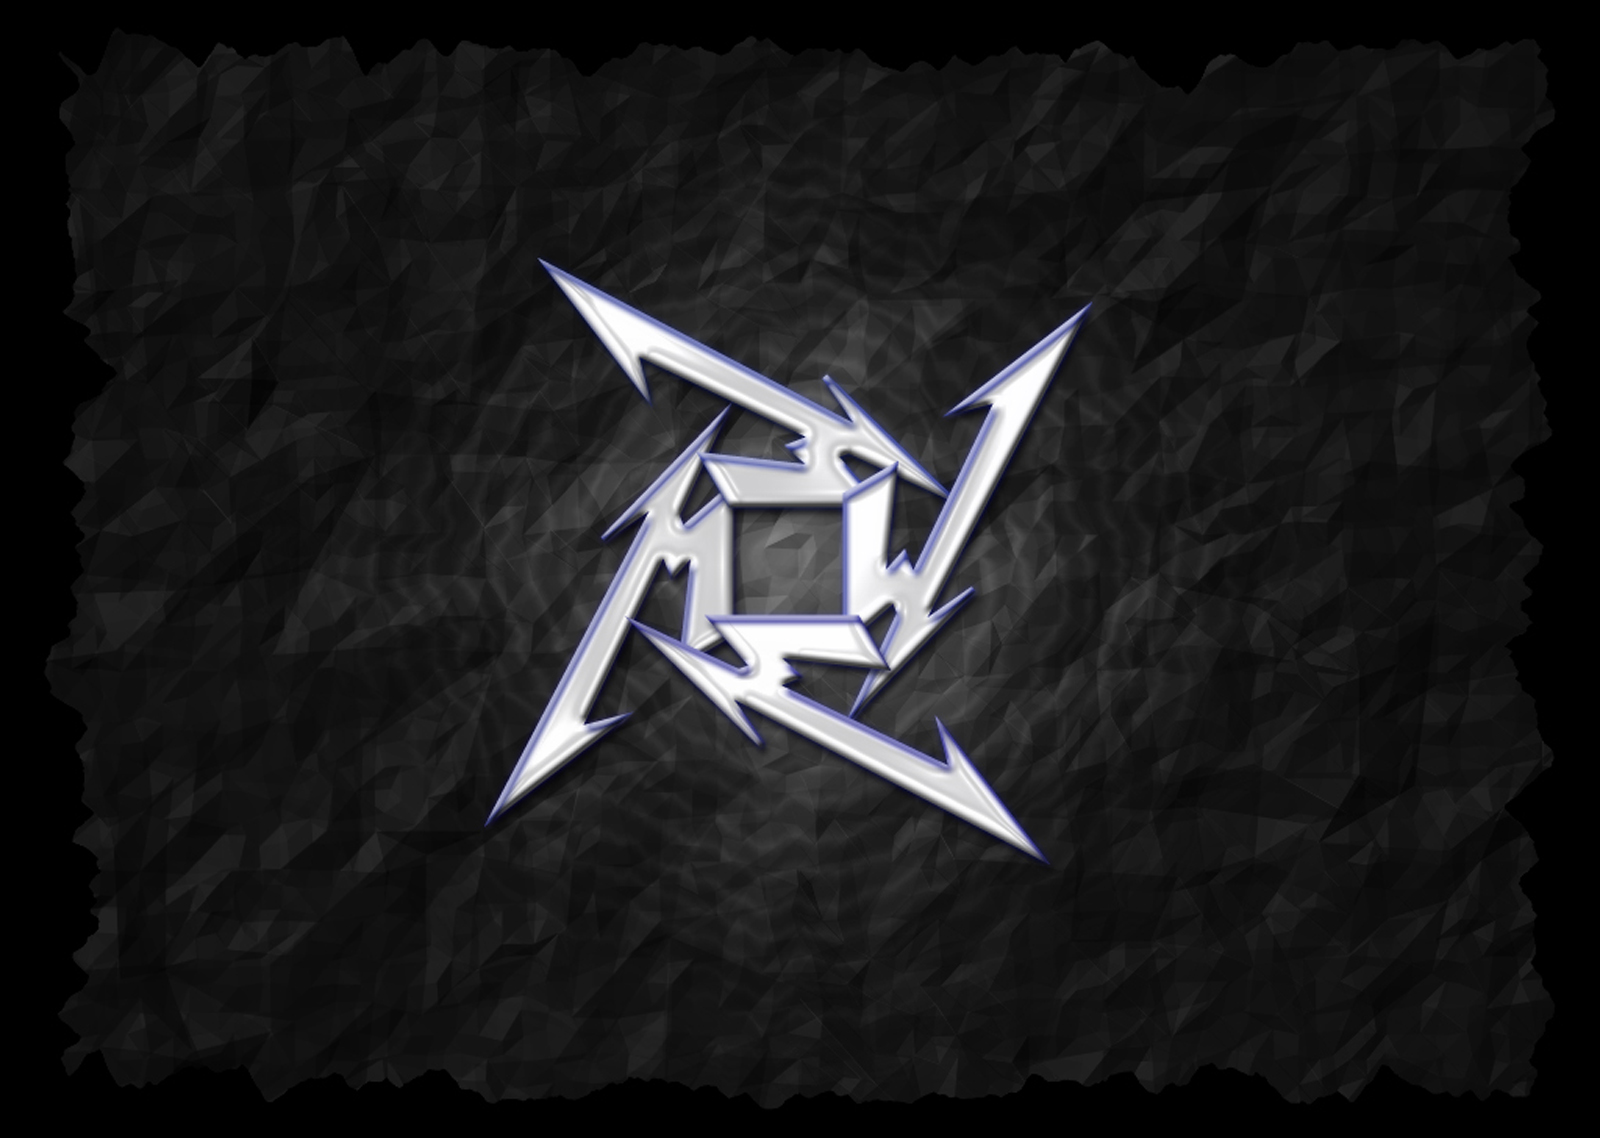 Central Wallpaper Metallica Logos Hd Desktop Wallpapers